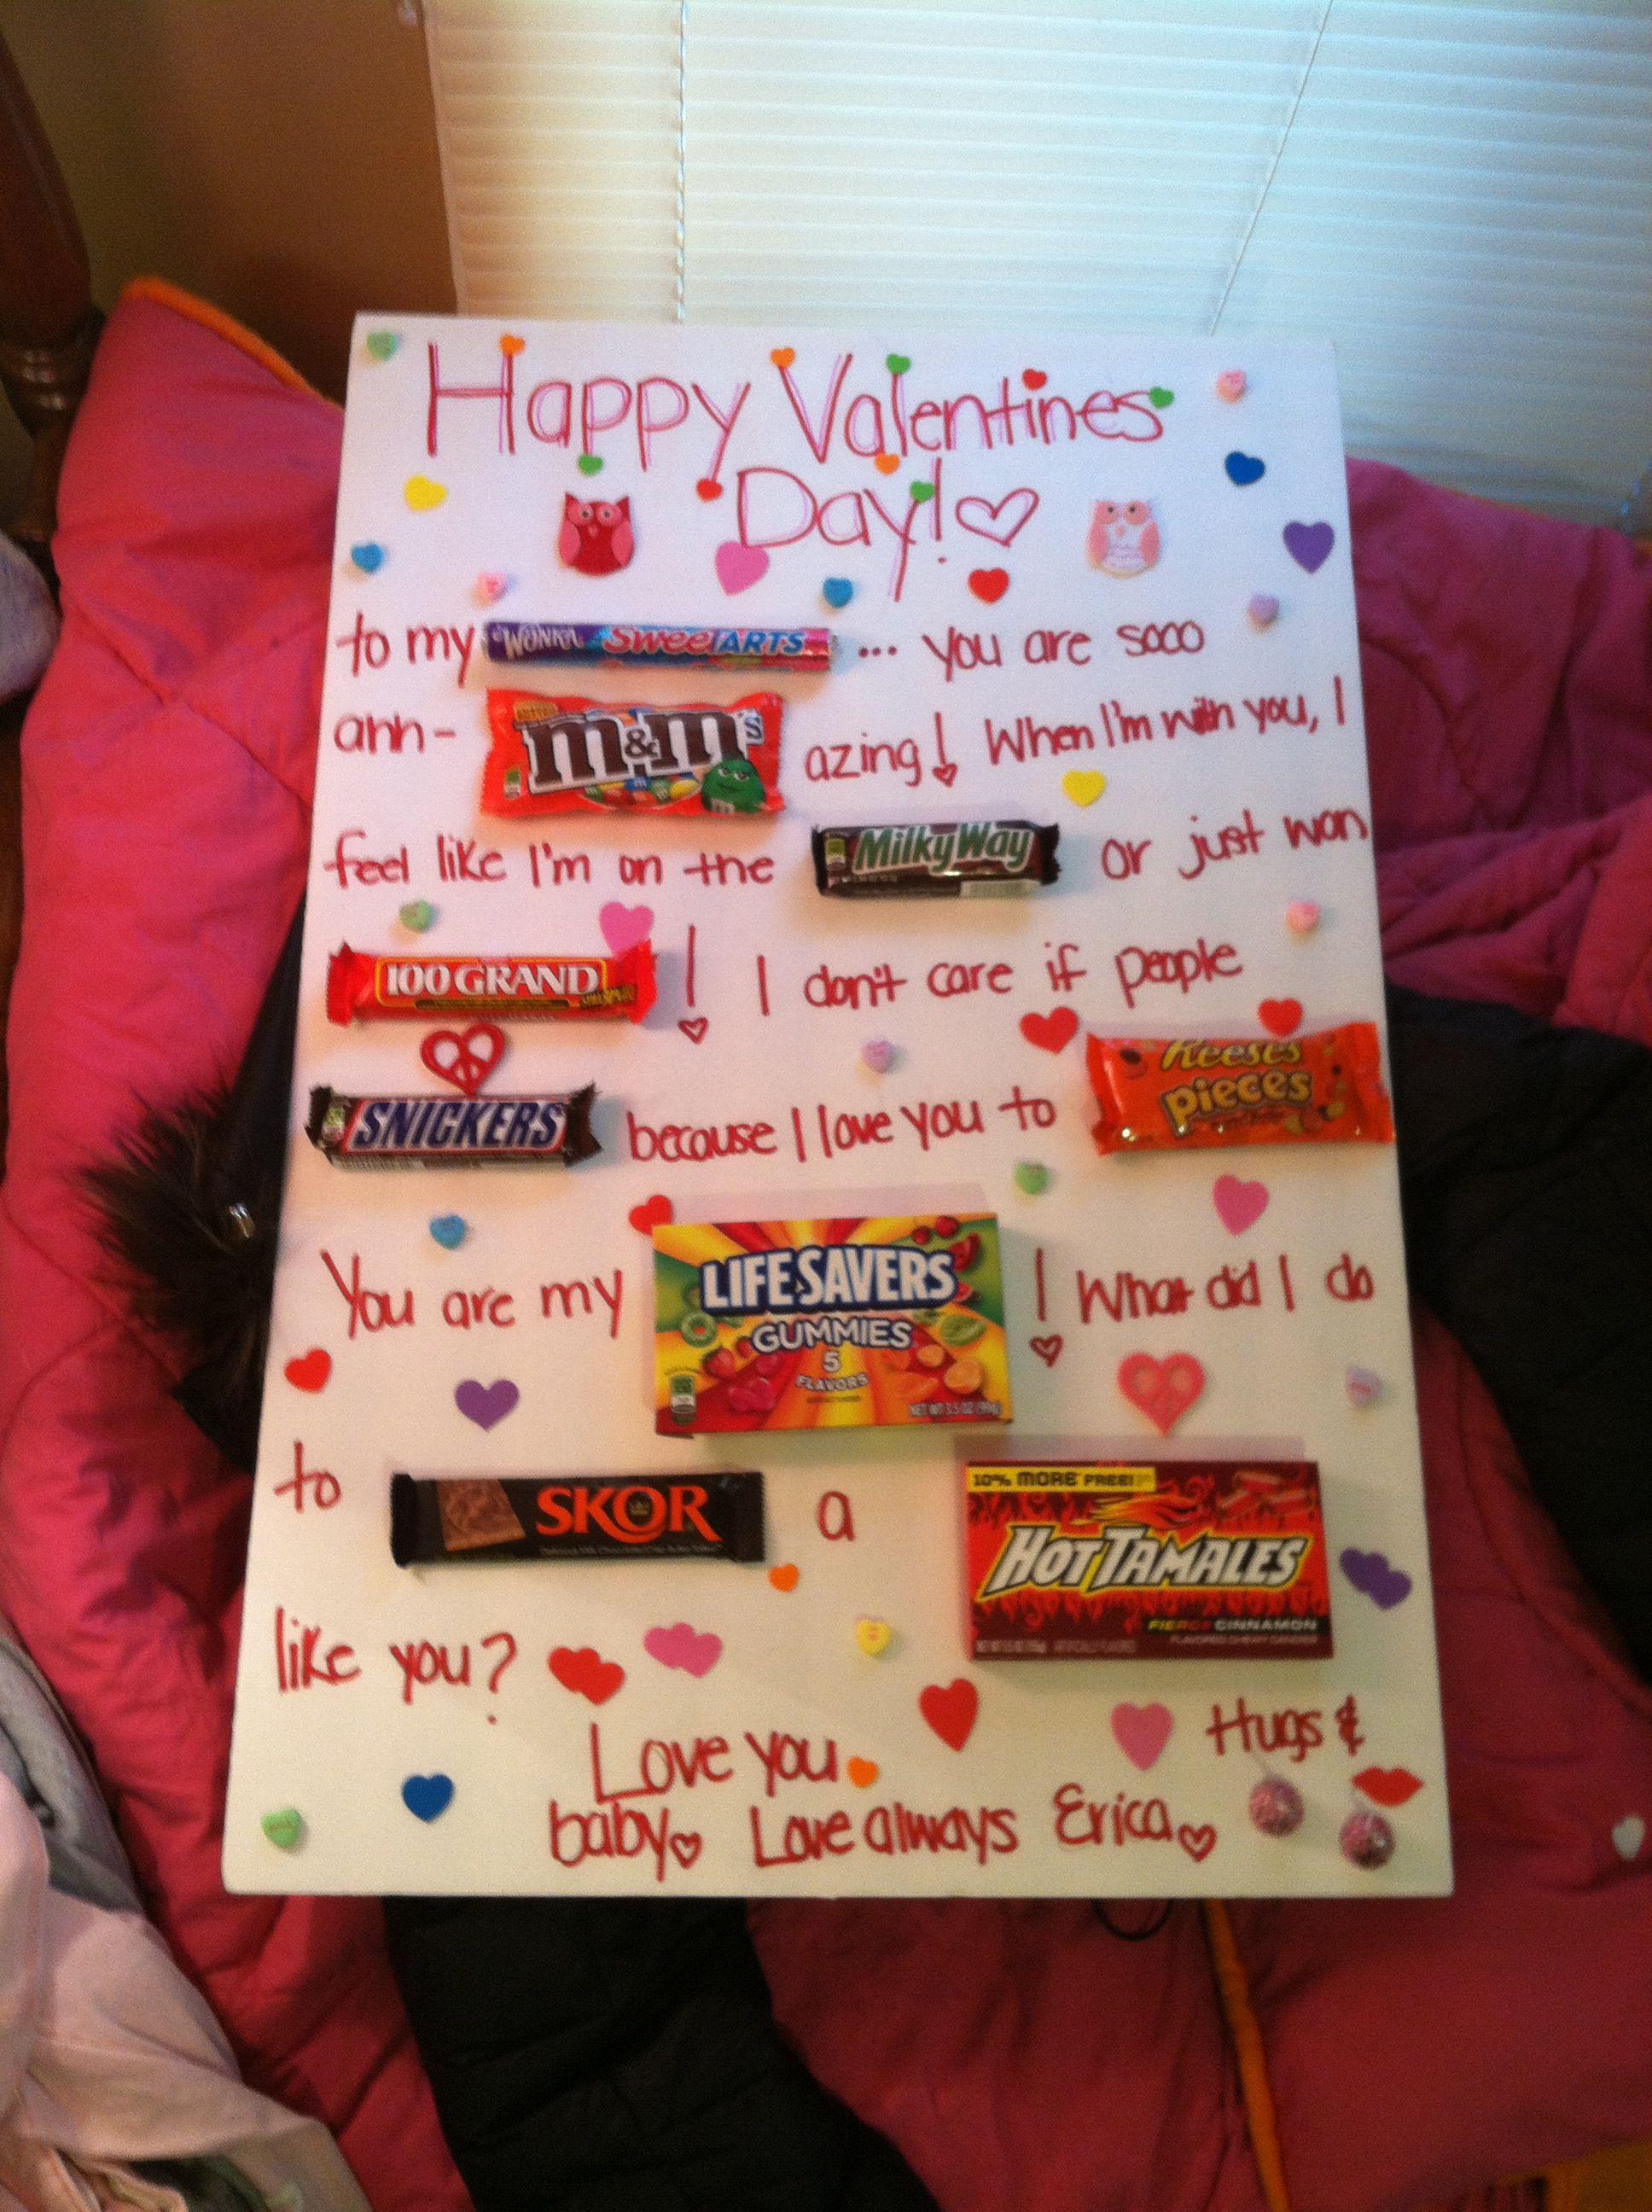 Made for my boyfriend on valentines day! | Everything | Pinterest ...